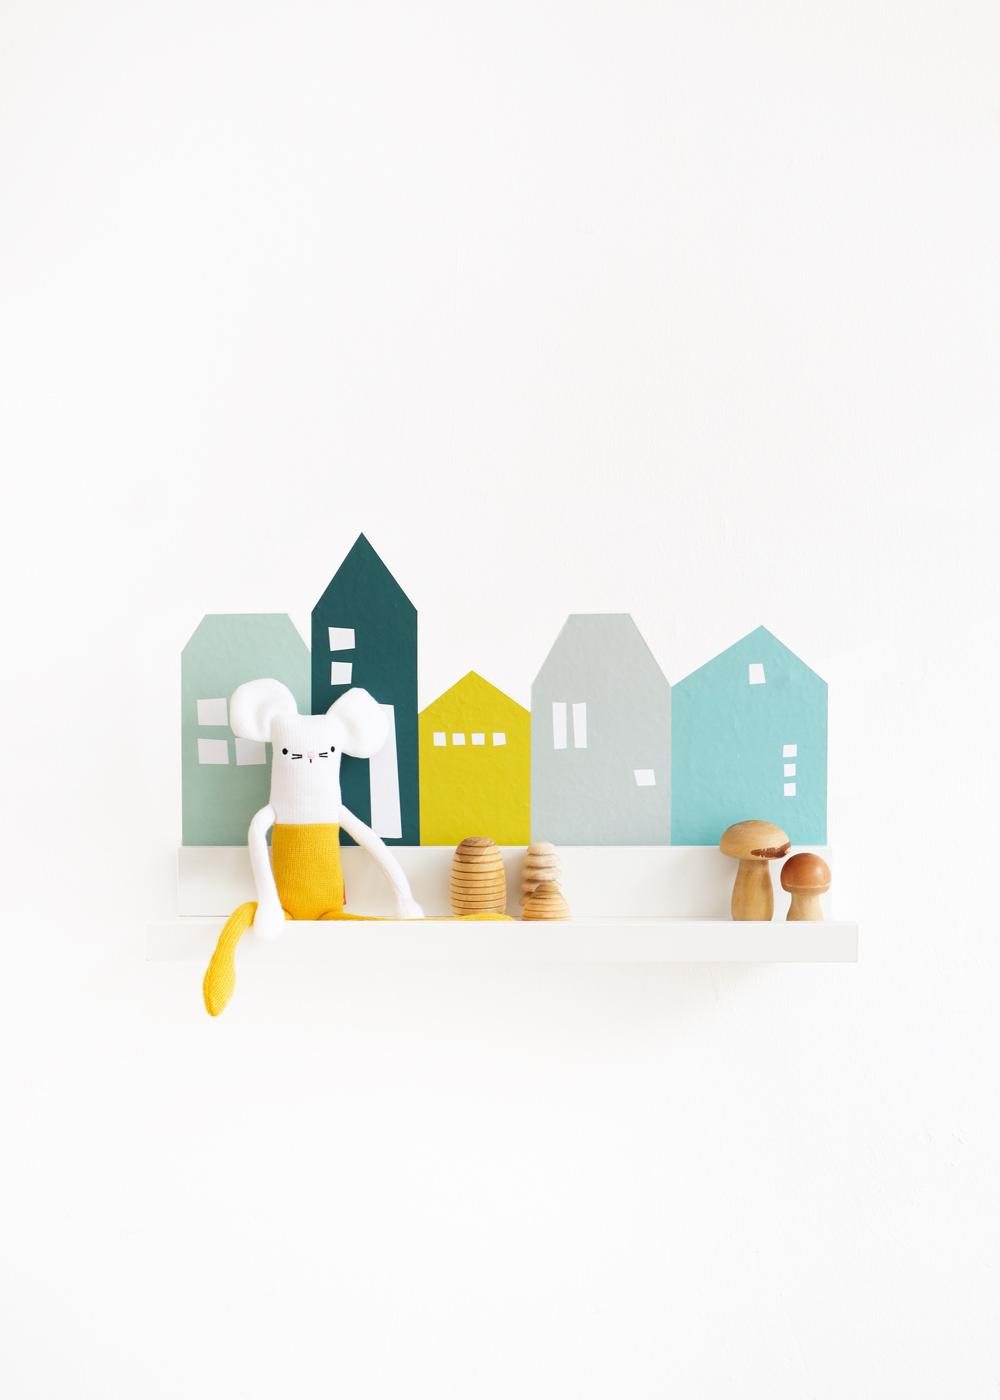 Ikea Mosslanda Bilderleiste Lille Hus mint Waldgrün Komplettansicht